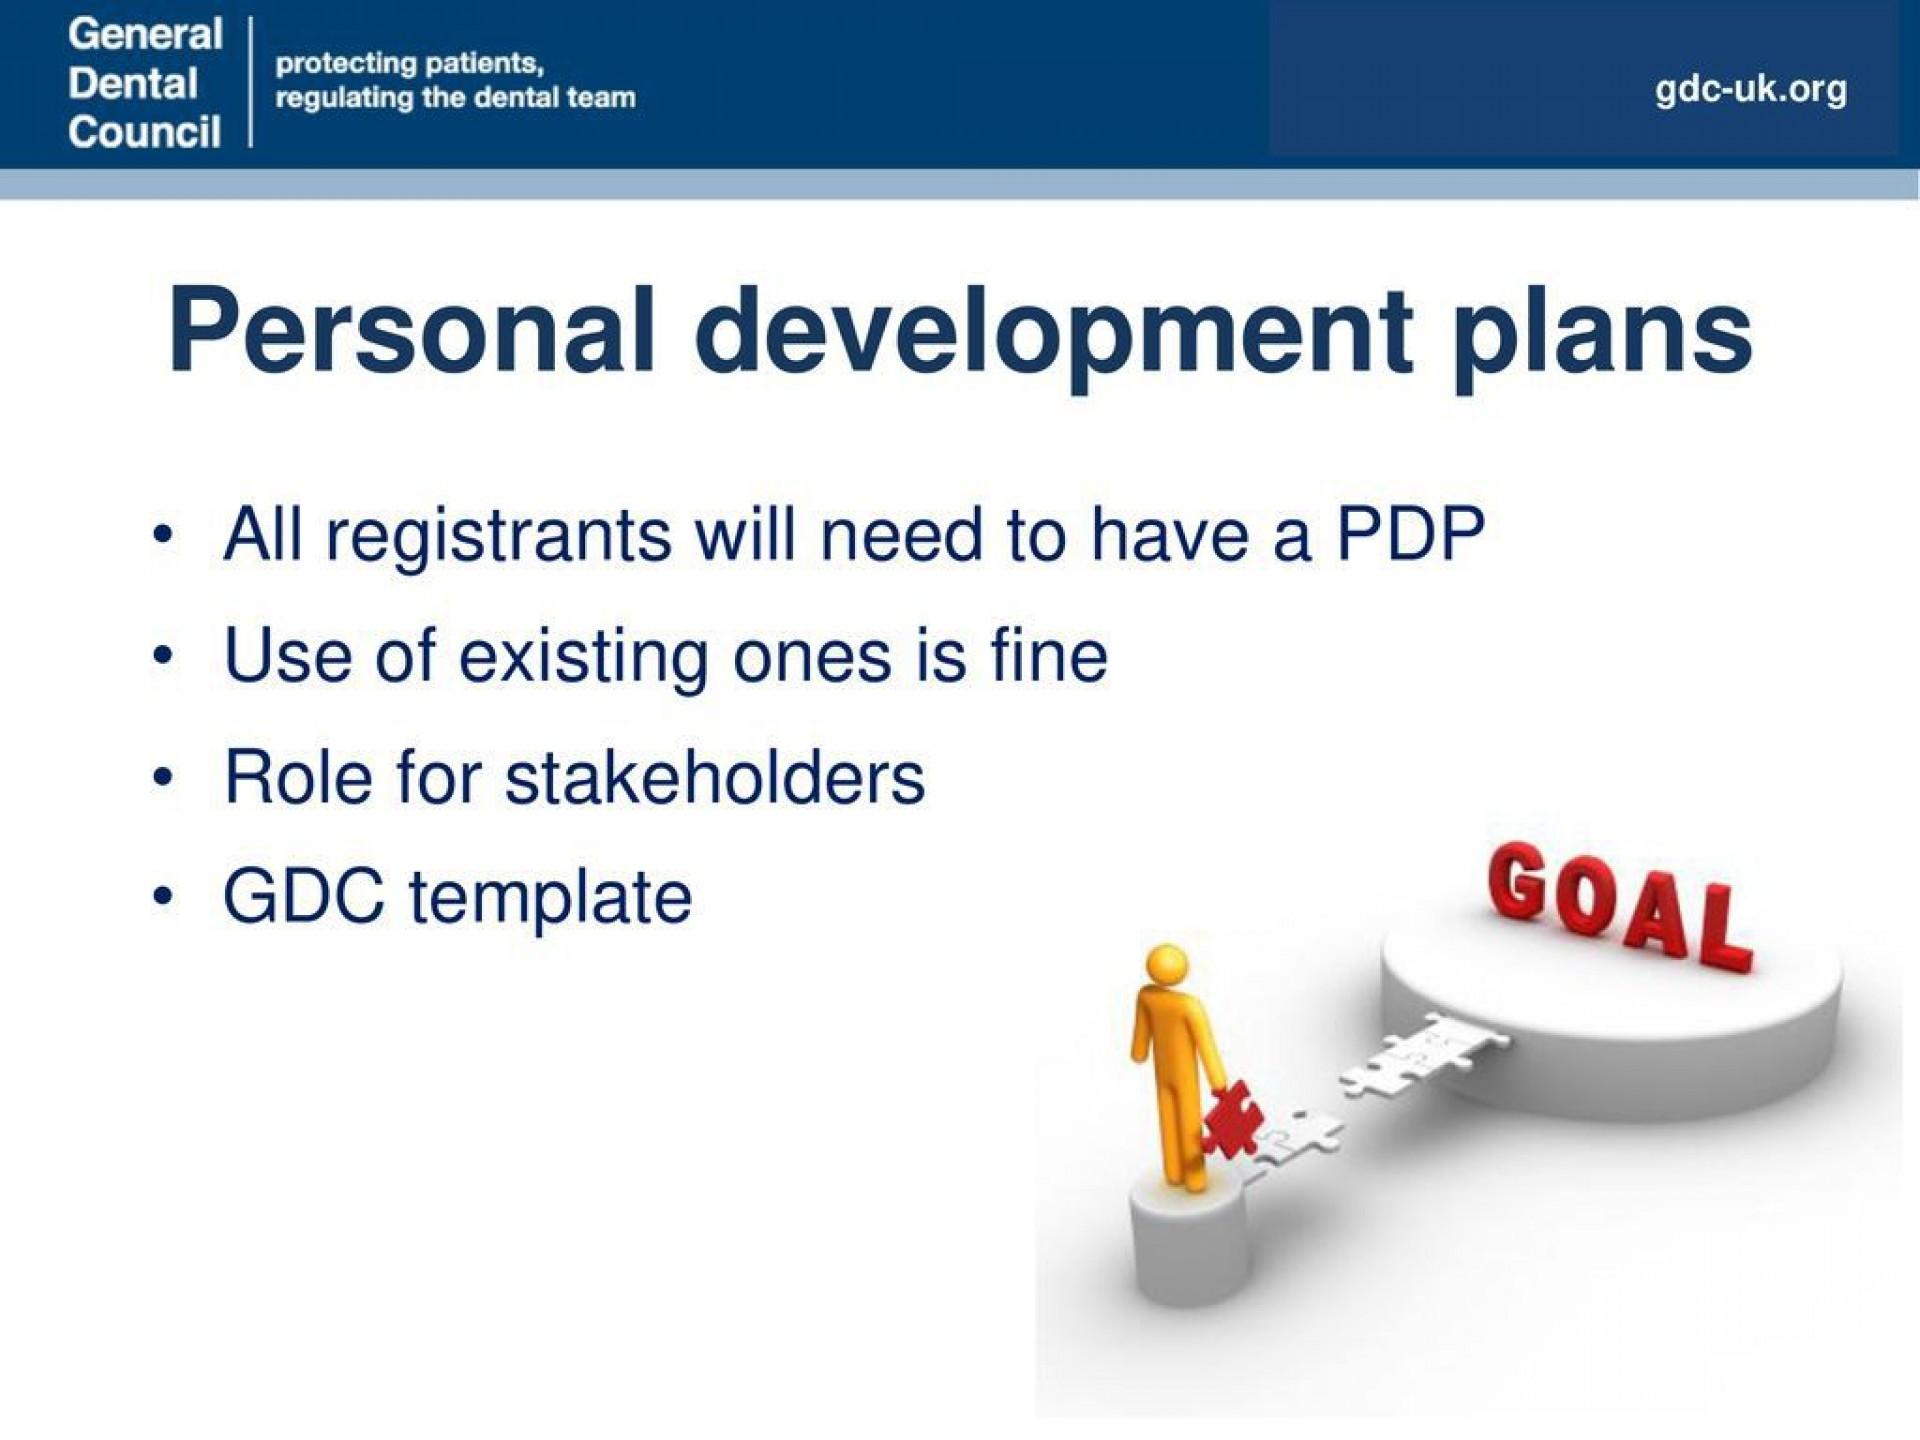 002 Dreaded Personal Development Plan Template Gdc Concept  Free1920